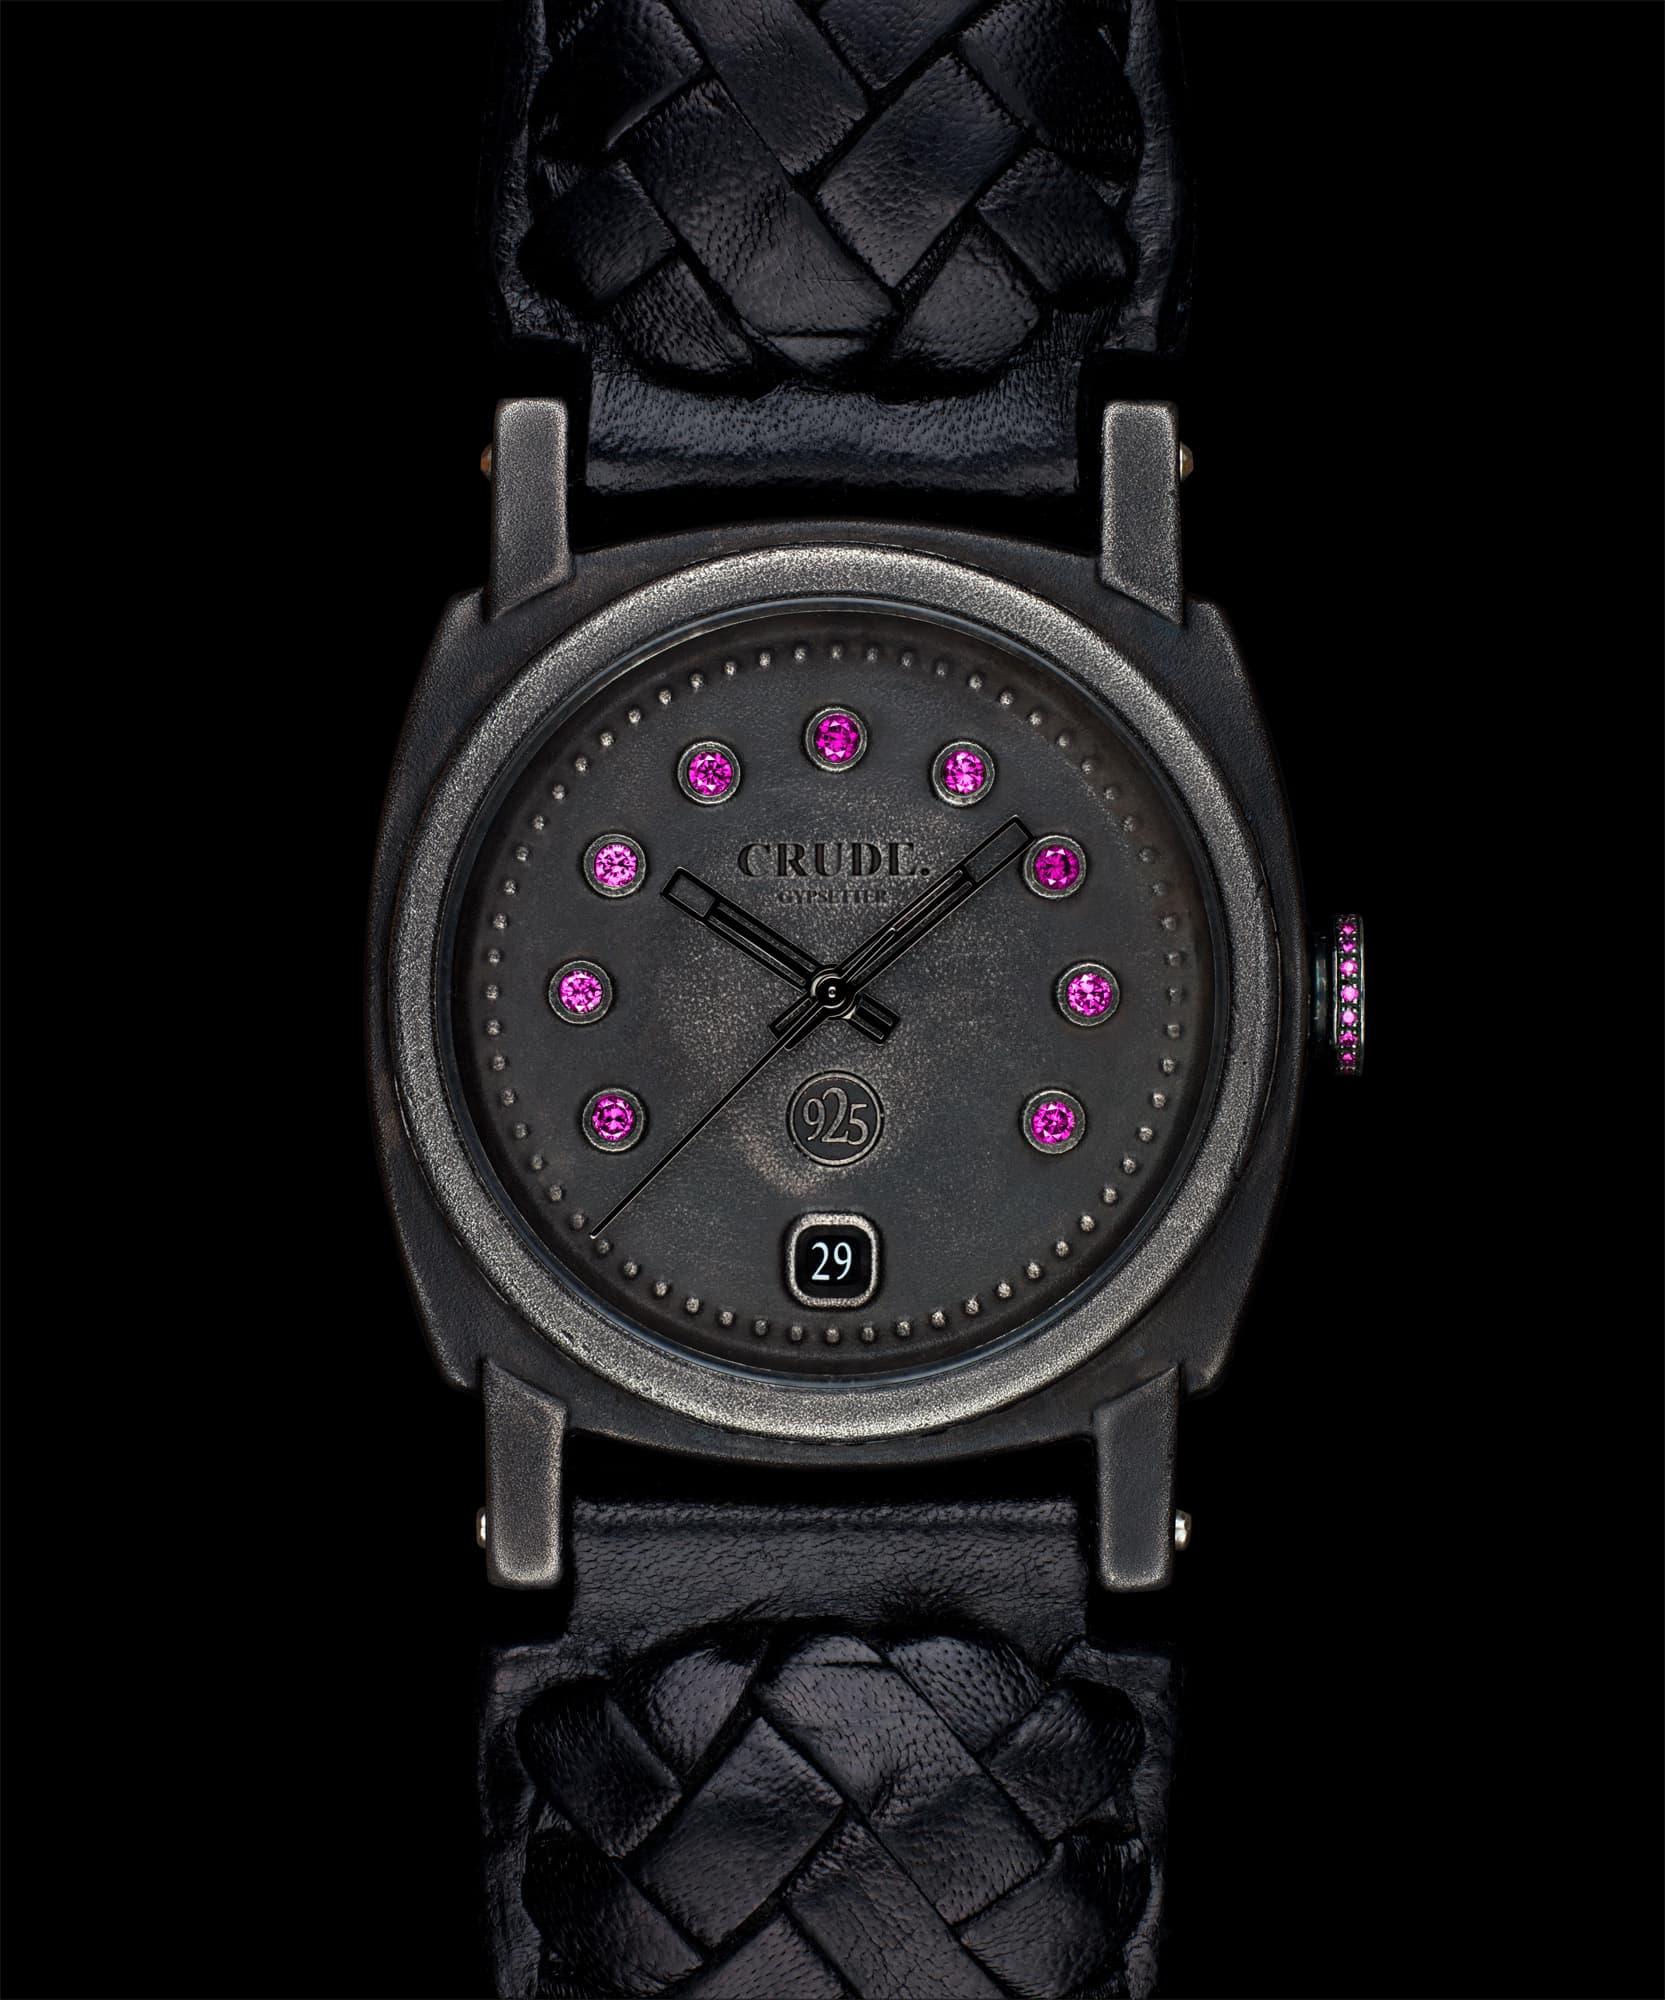 gypsetter-crude-pink-diamond